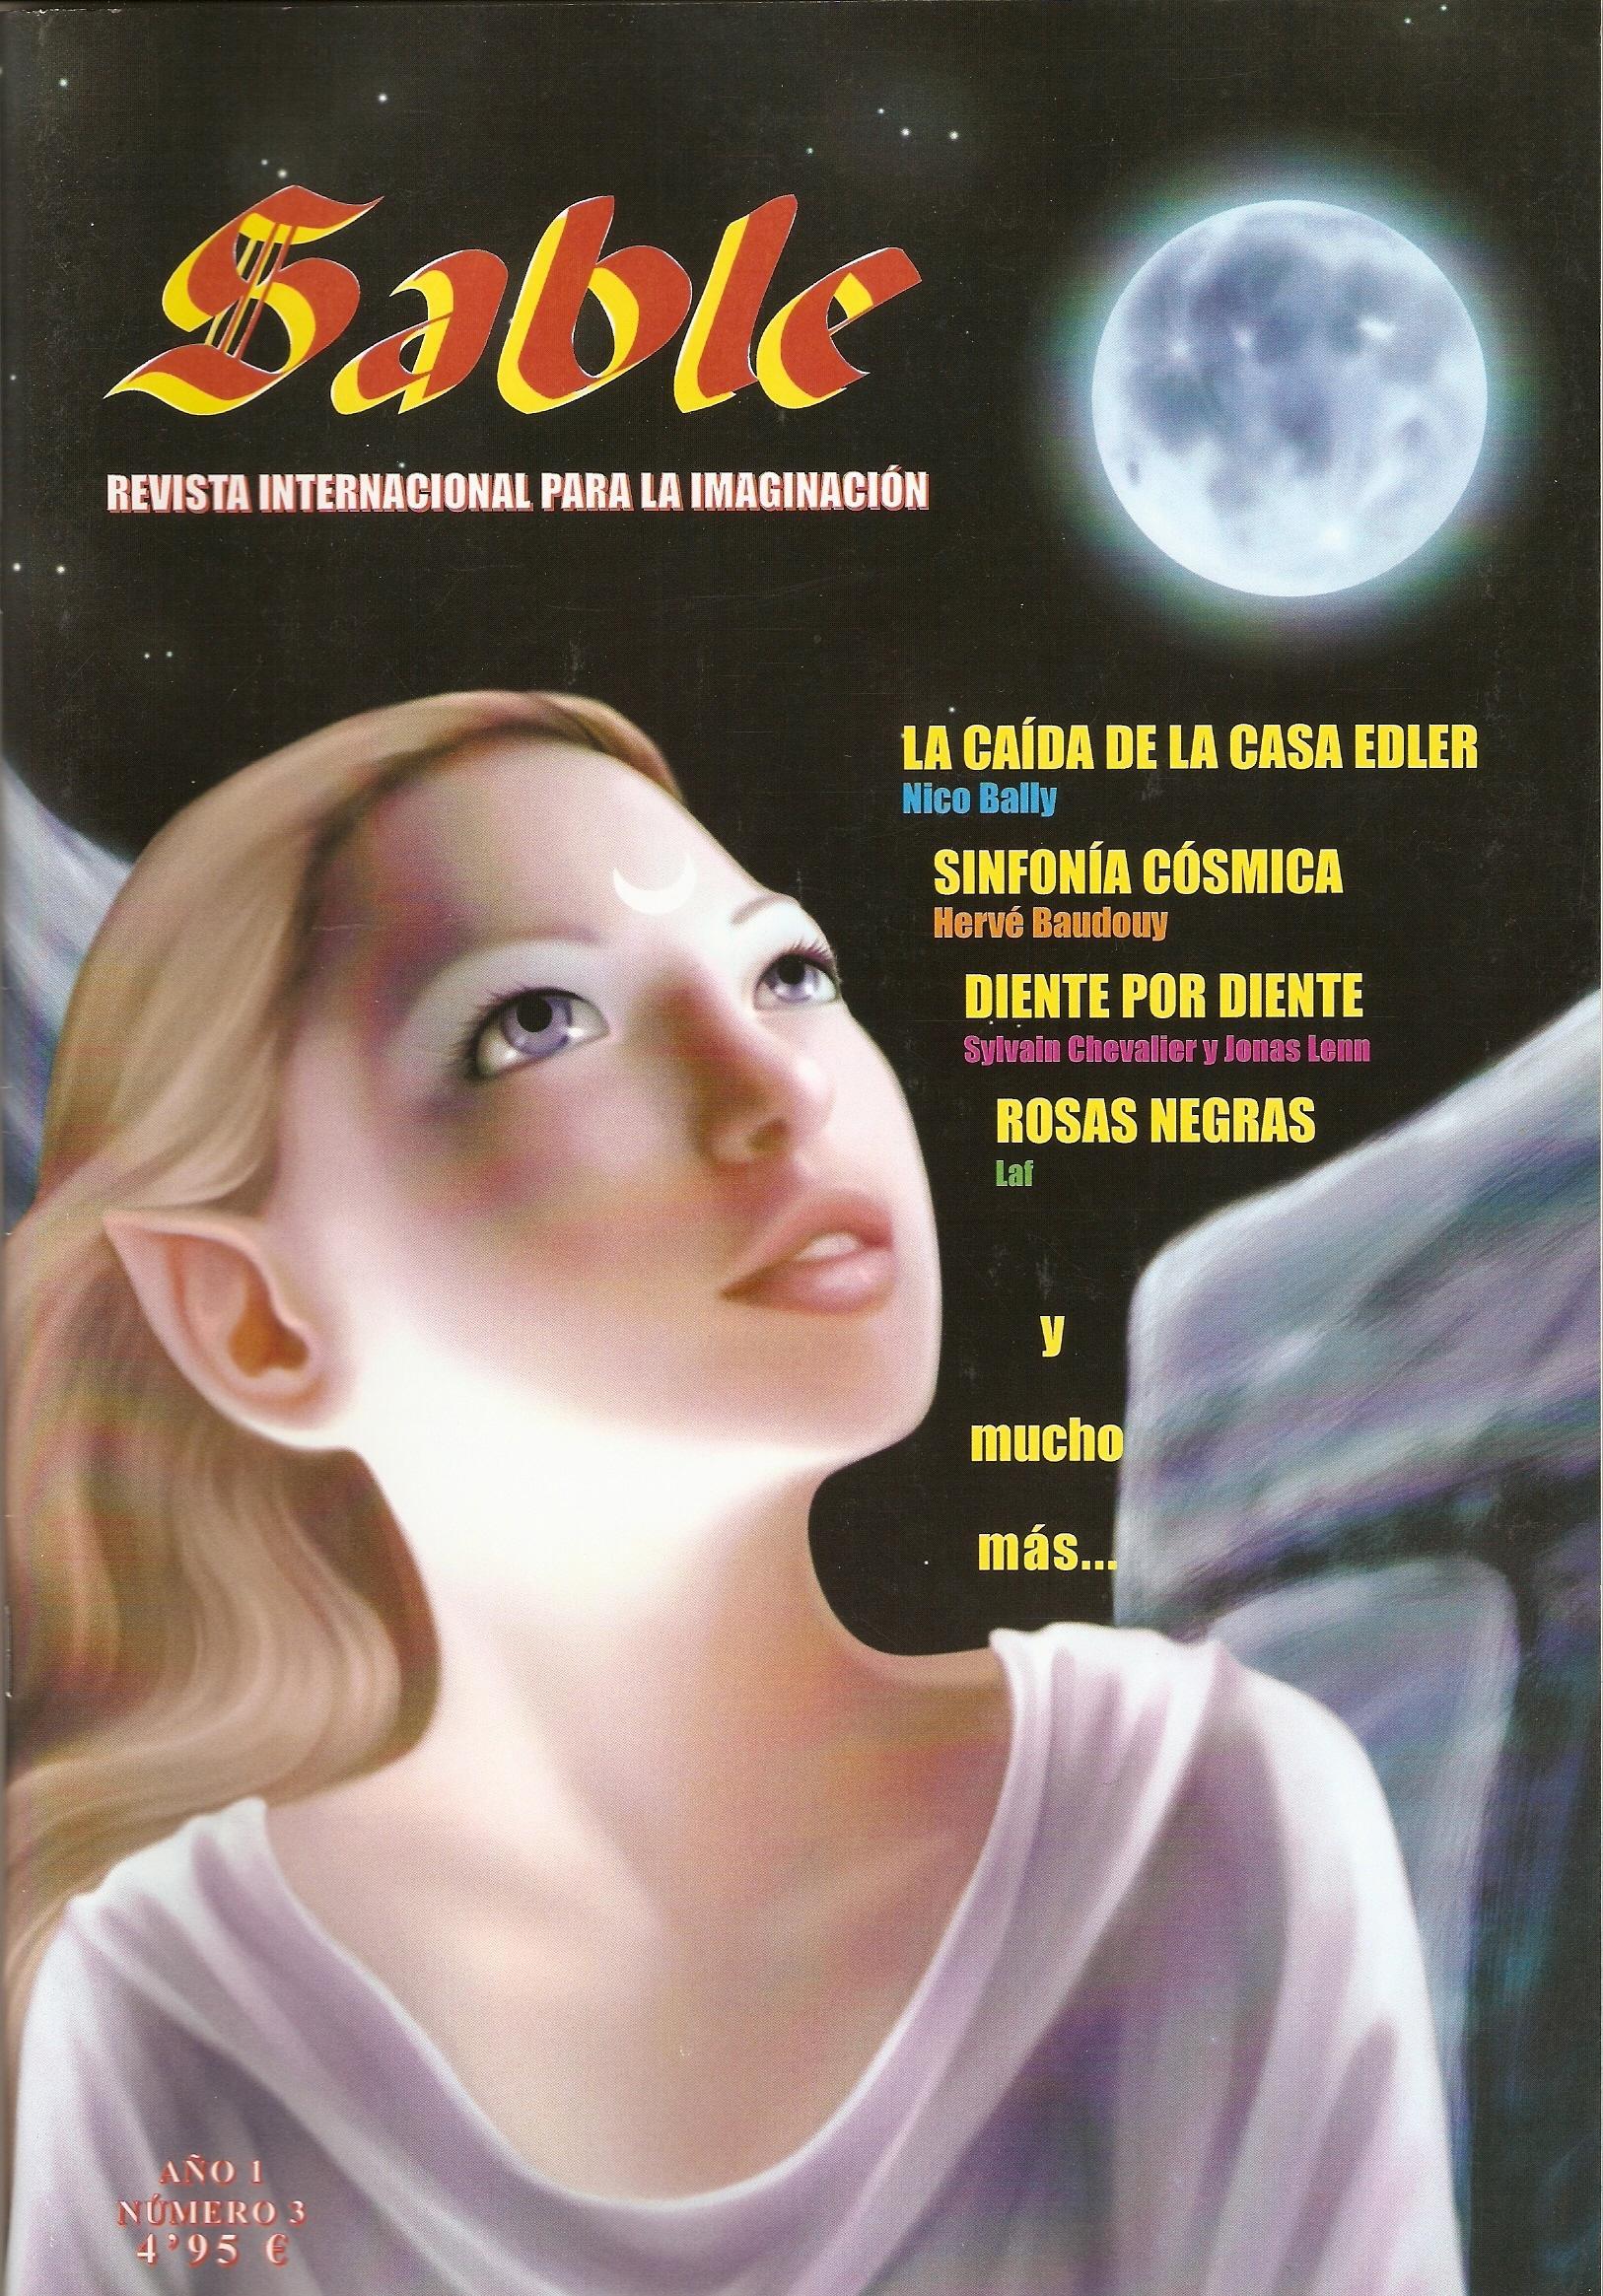 Sable #3